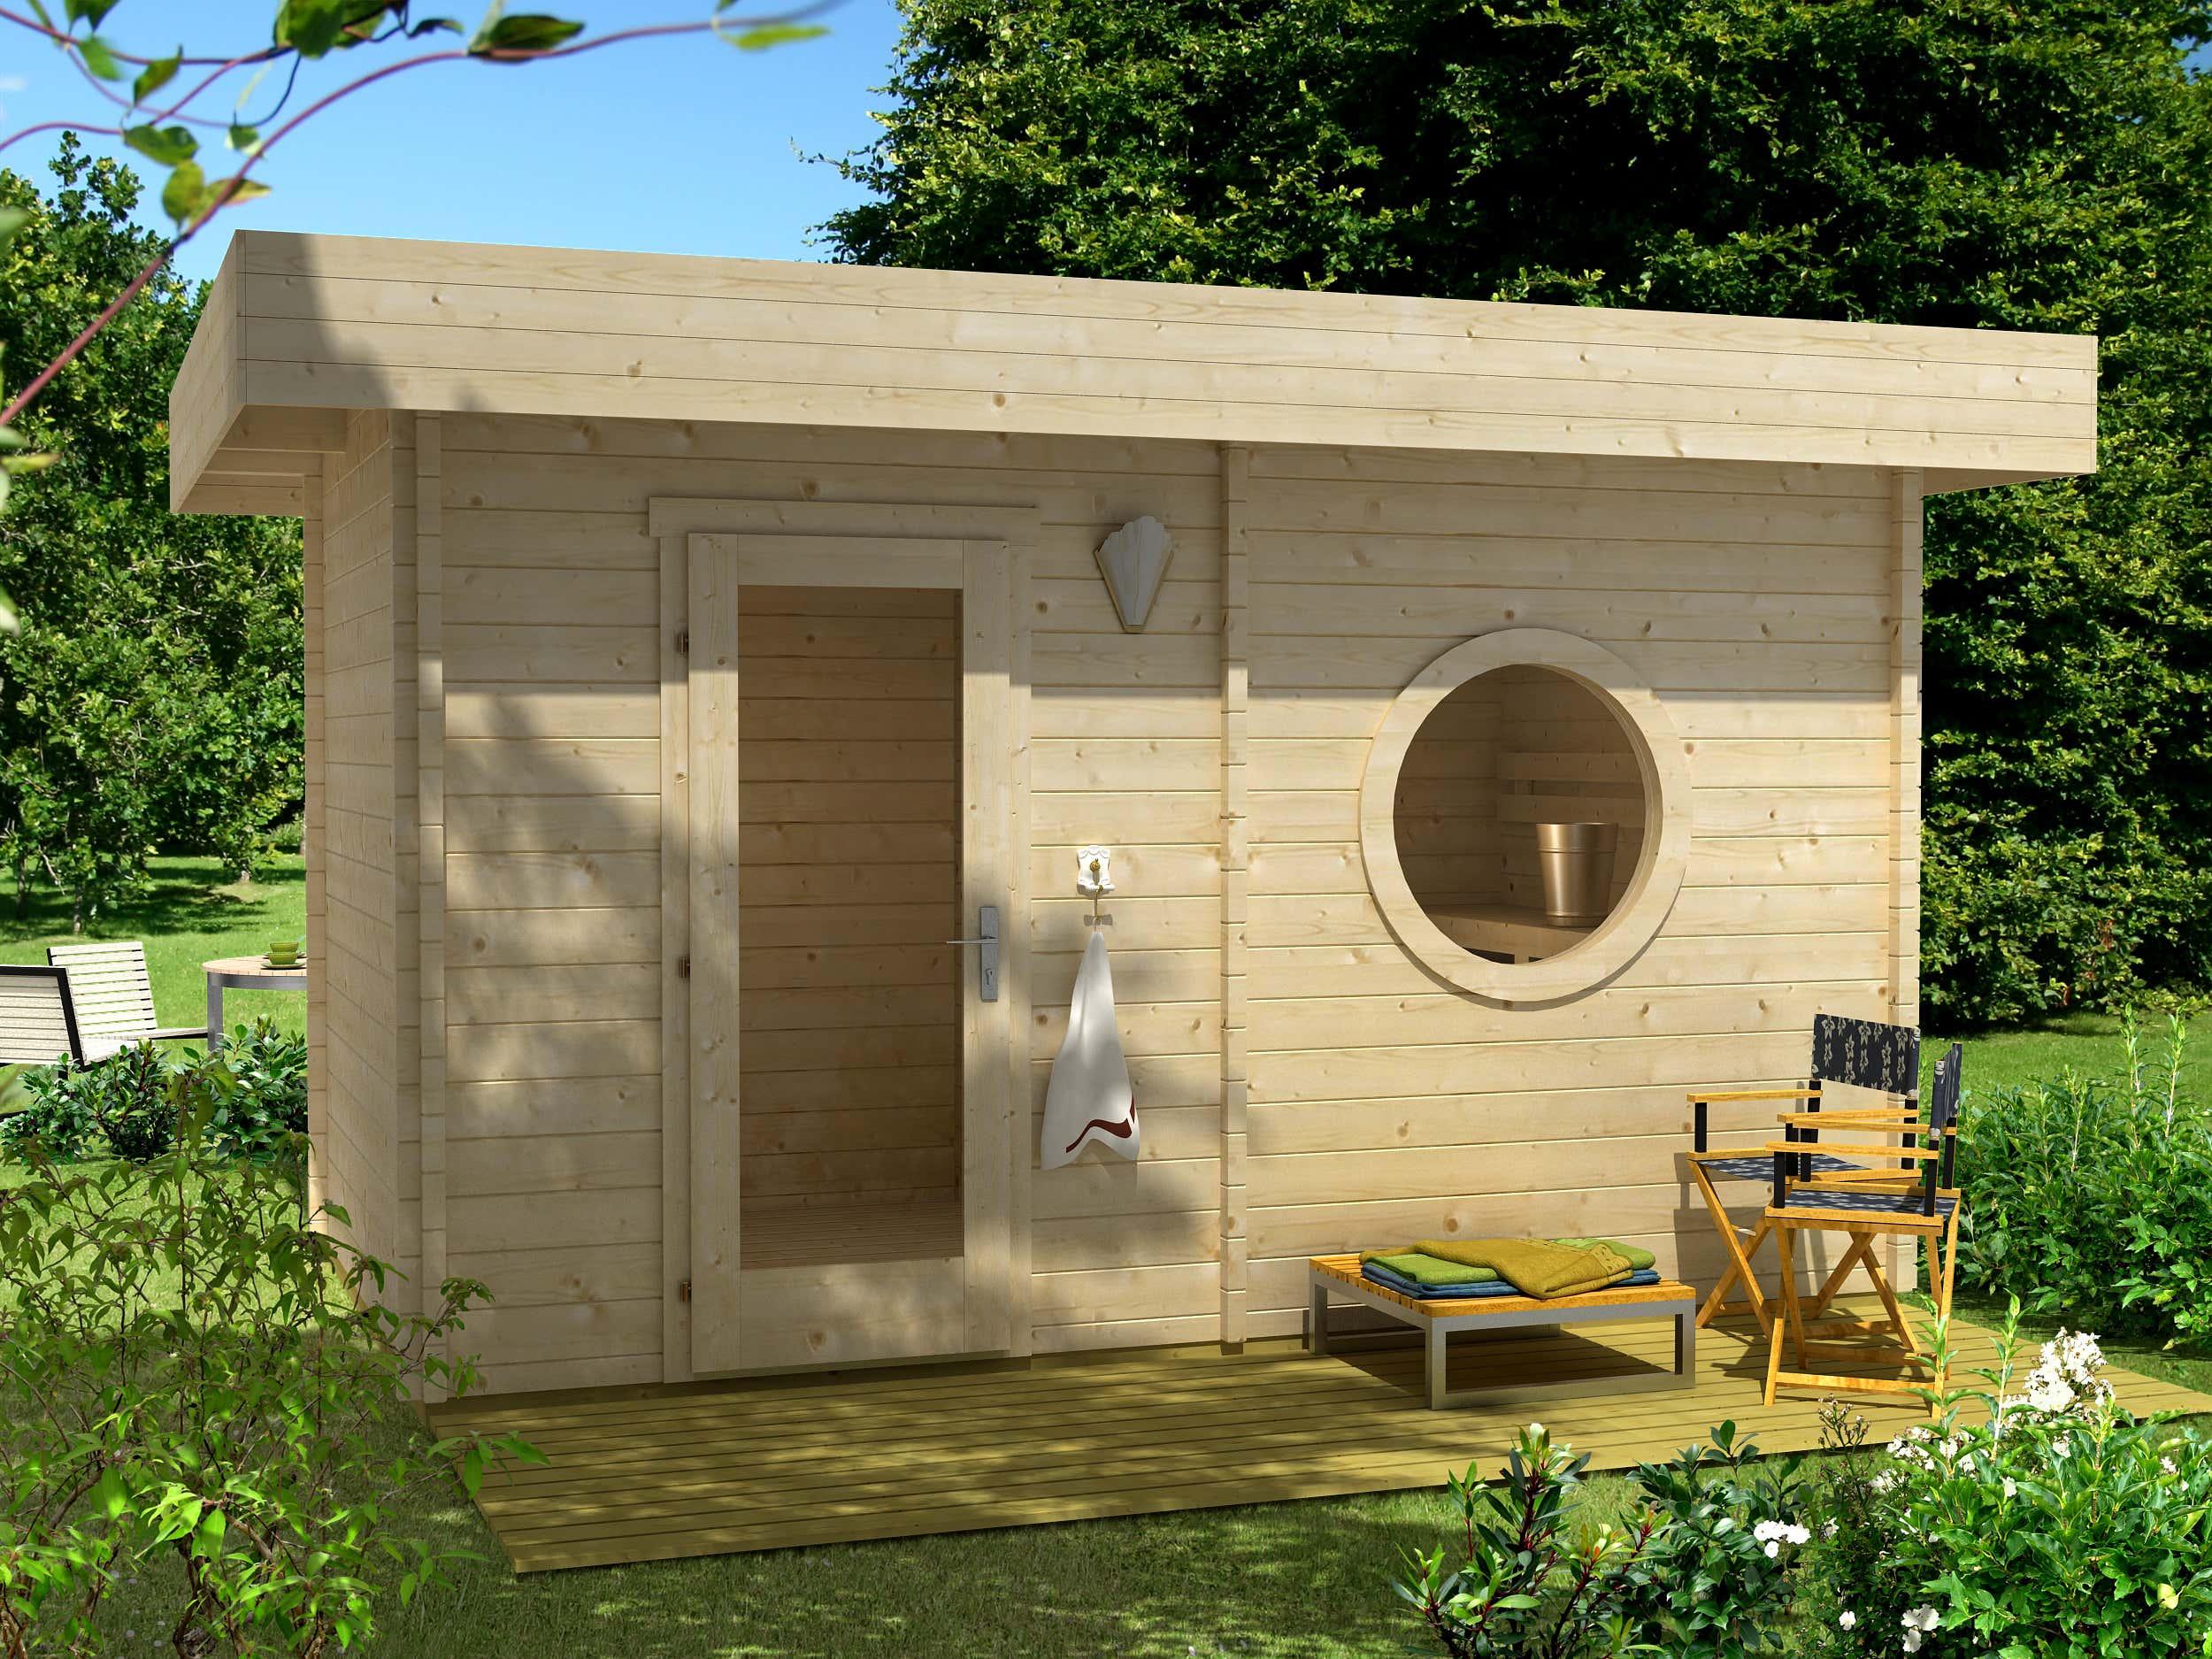 saunahaus cubus 70 c saunahaus cubus 70 c a z gartenhaus gmbh. Black Bedroom Furniture Sets. Home Design Ideas